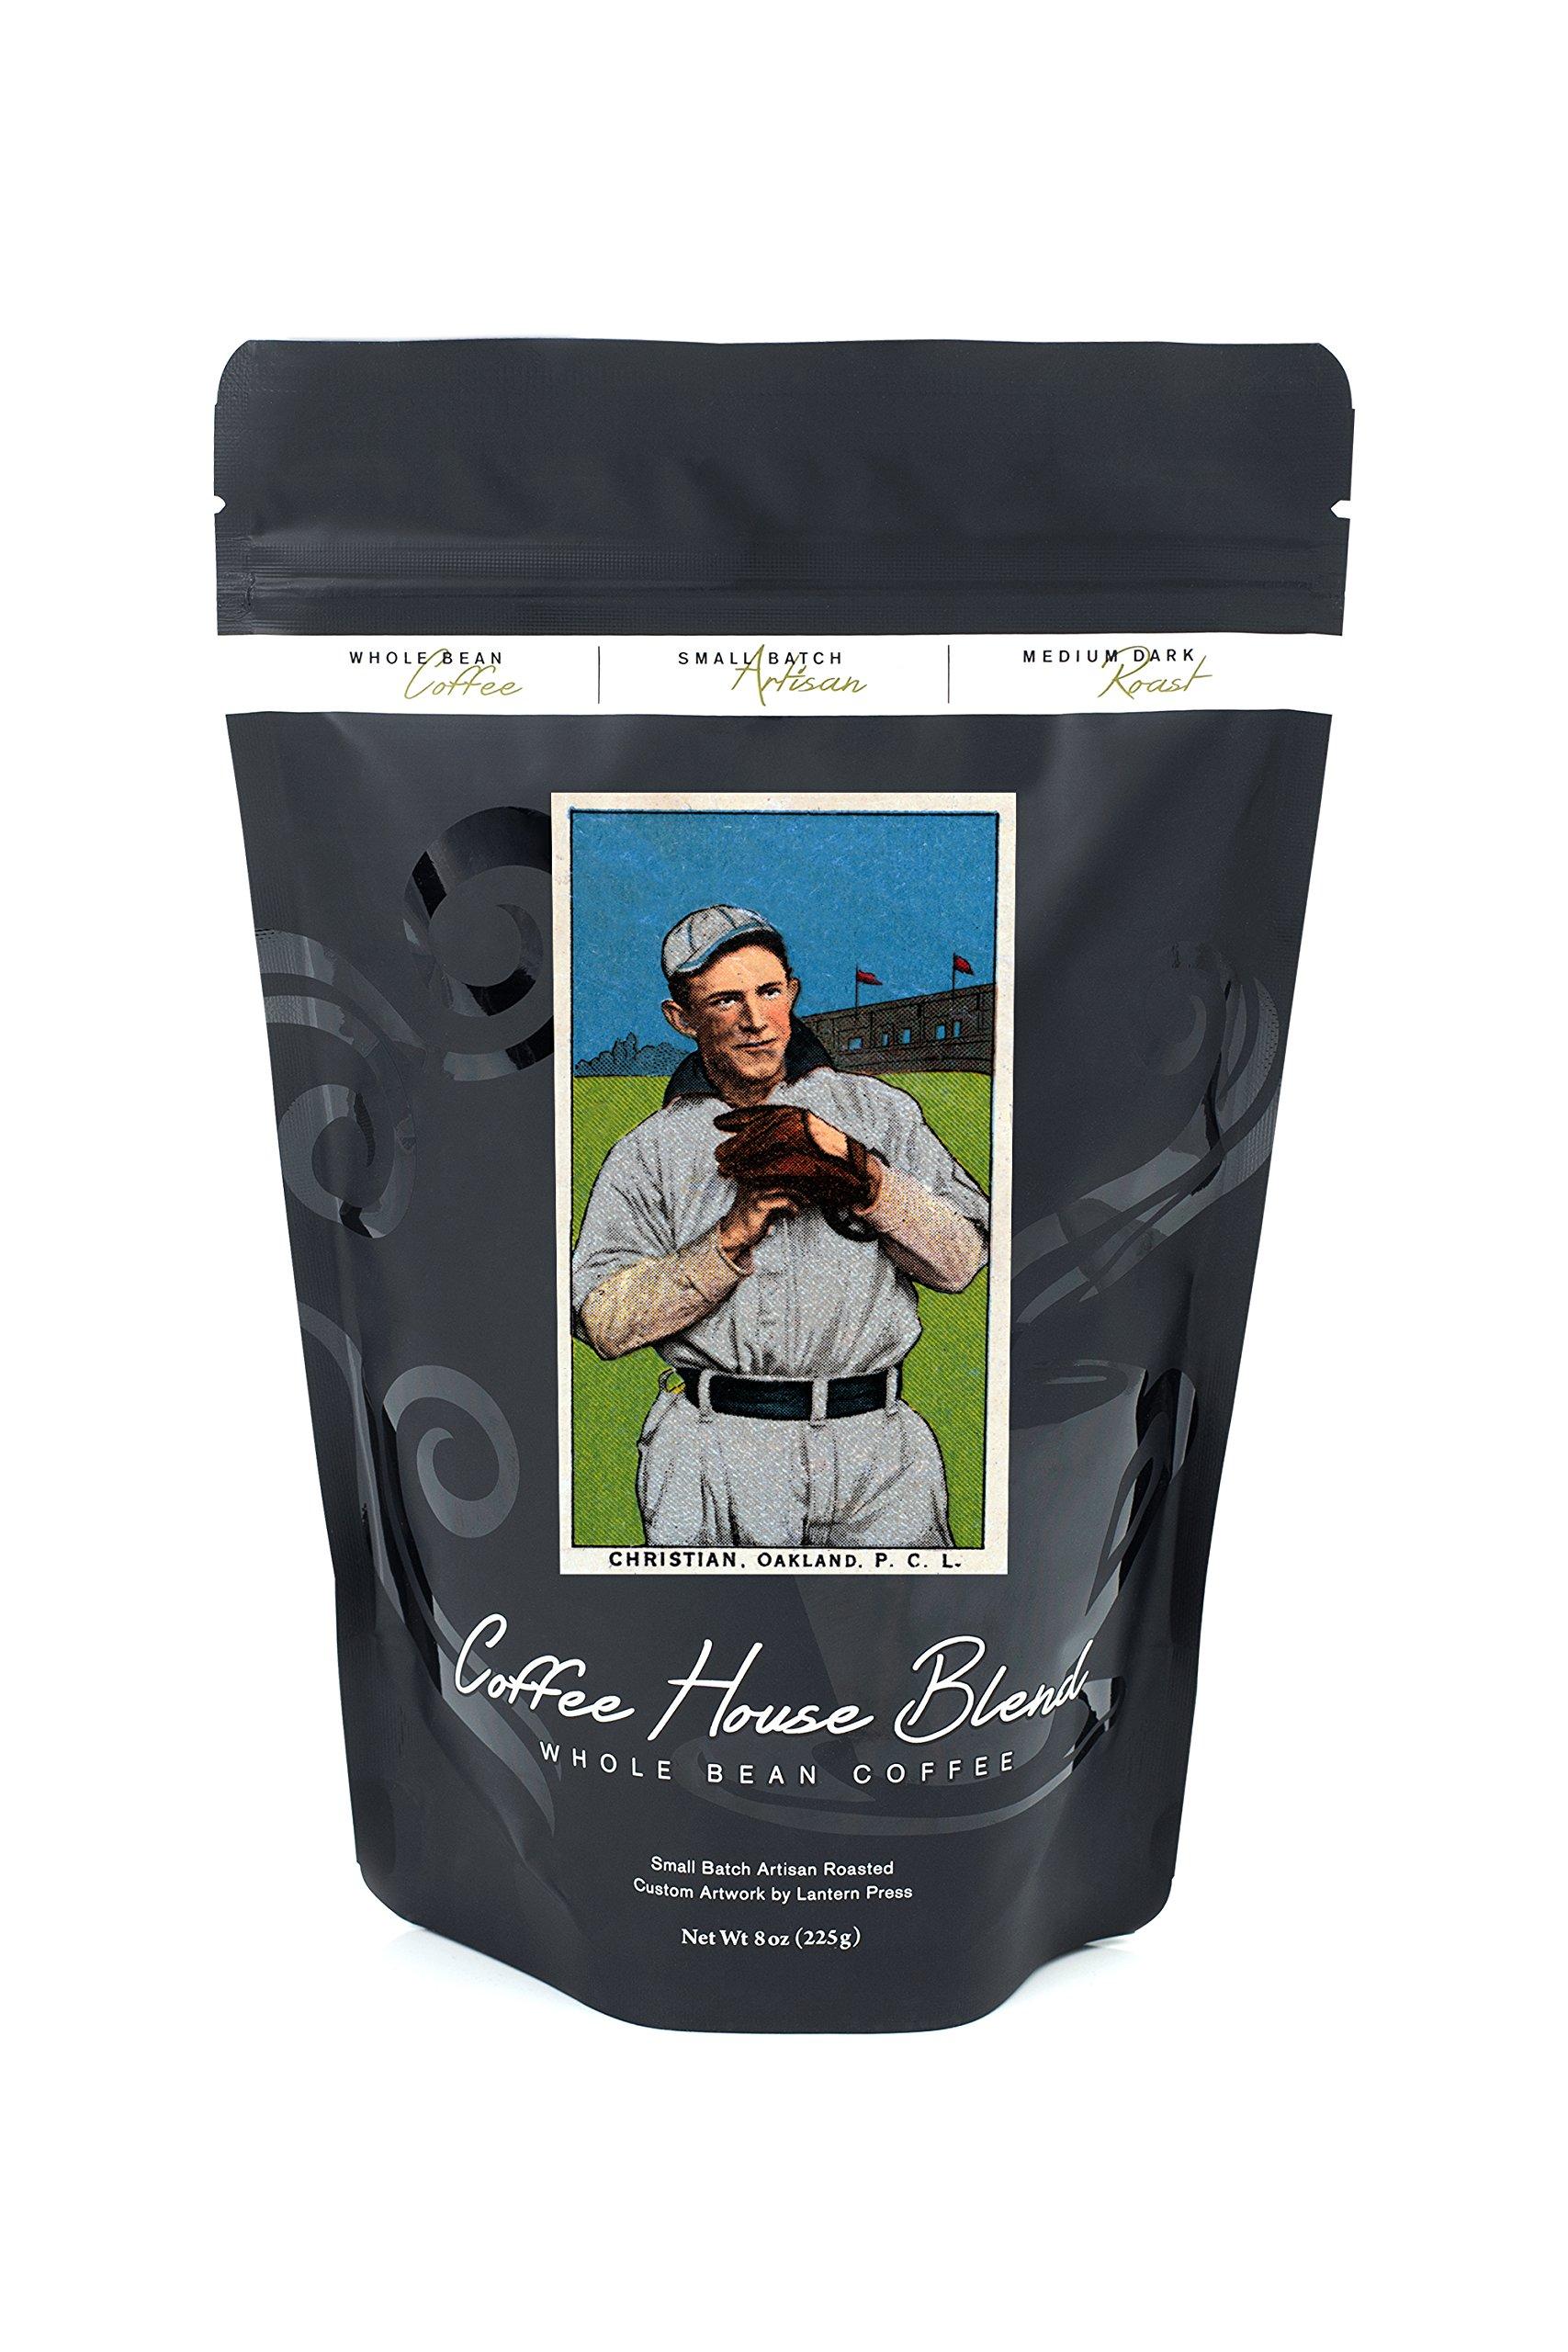 Oakland Pacific Coast League - Christian - Baseball Card (8oz Whole Bean Small Batch Artisan Coffee - Bold & Strong Medium Dark Roast w/ Artwork)